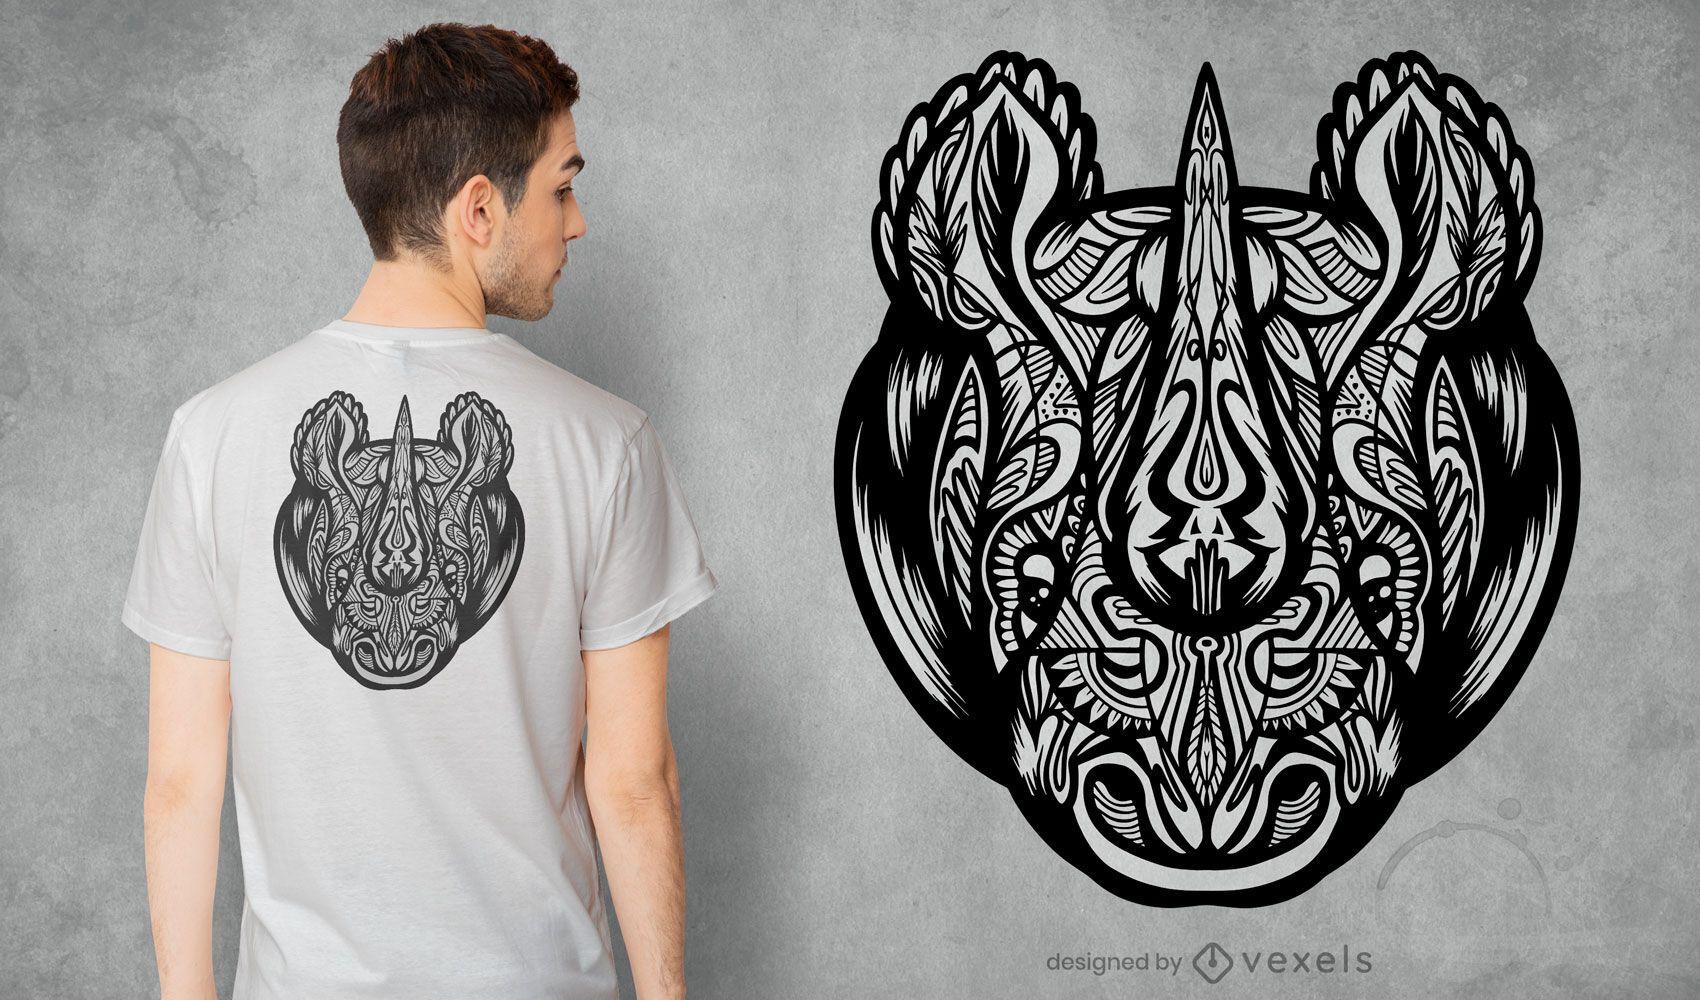 Mandala rhino t-shirt design